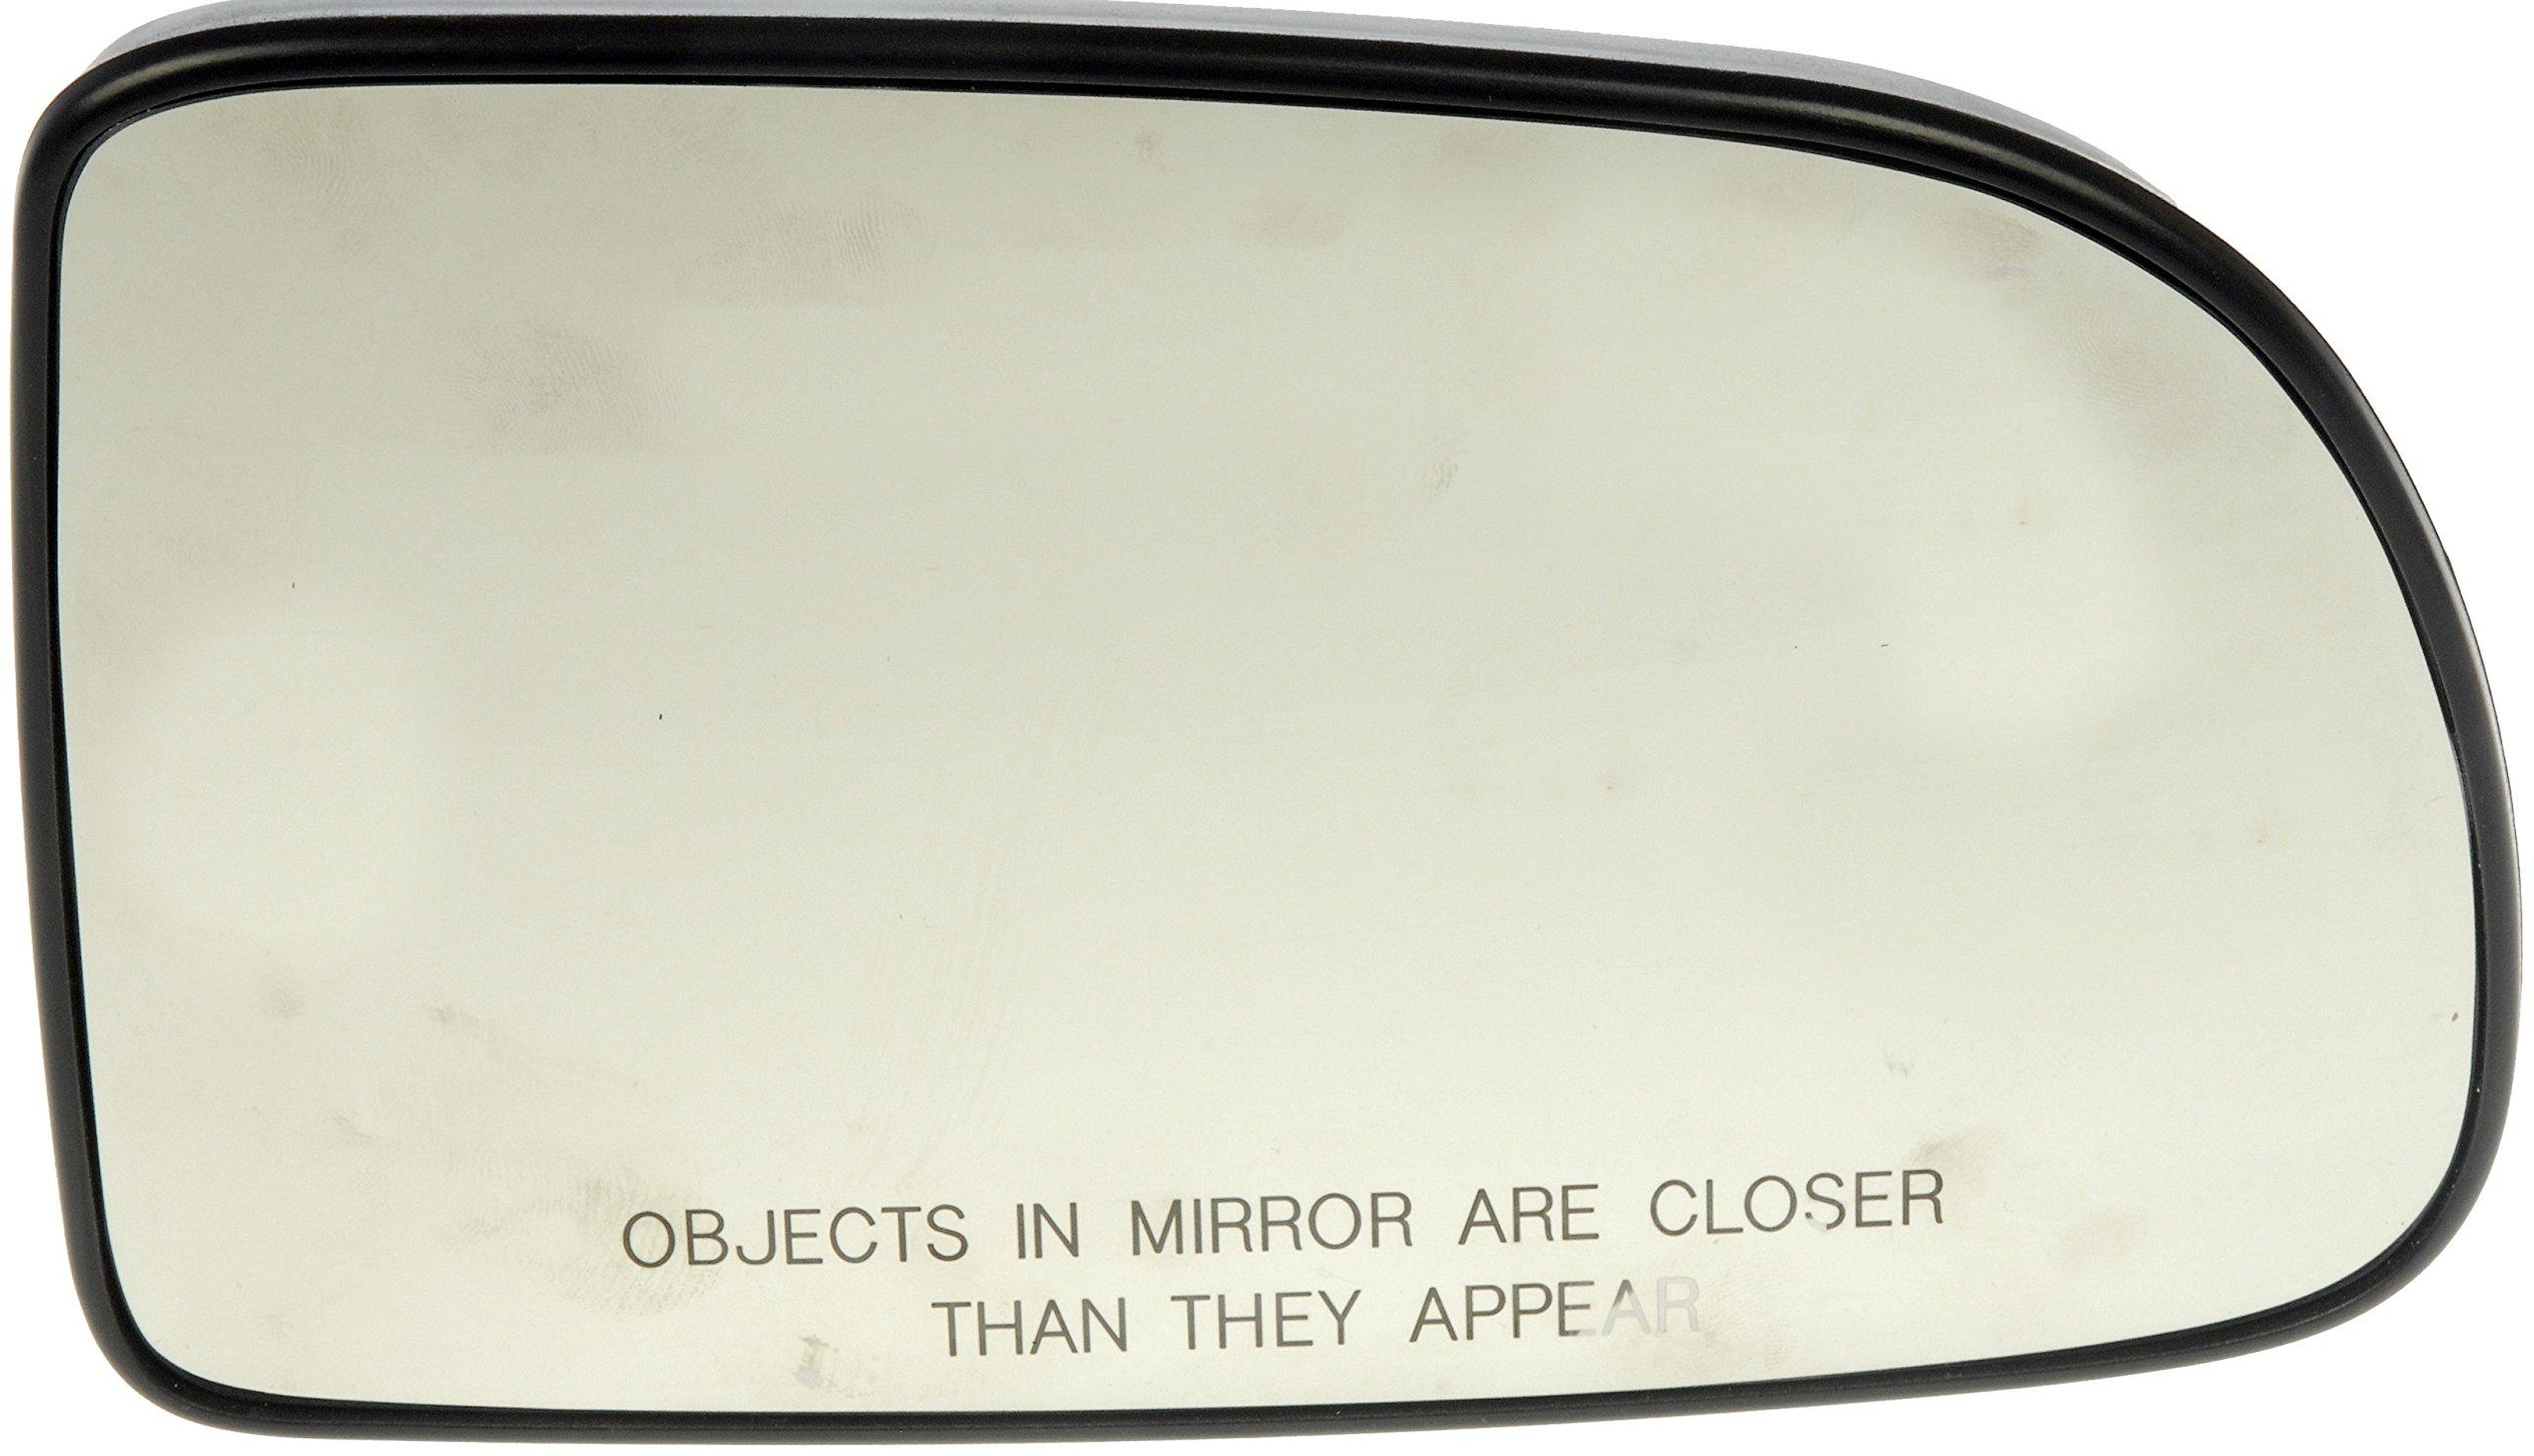 Dorman 56166 Passenger Side Non-Heated Plastic Backed Mirror Glass